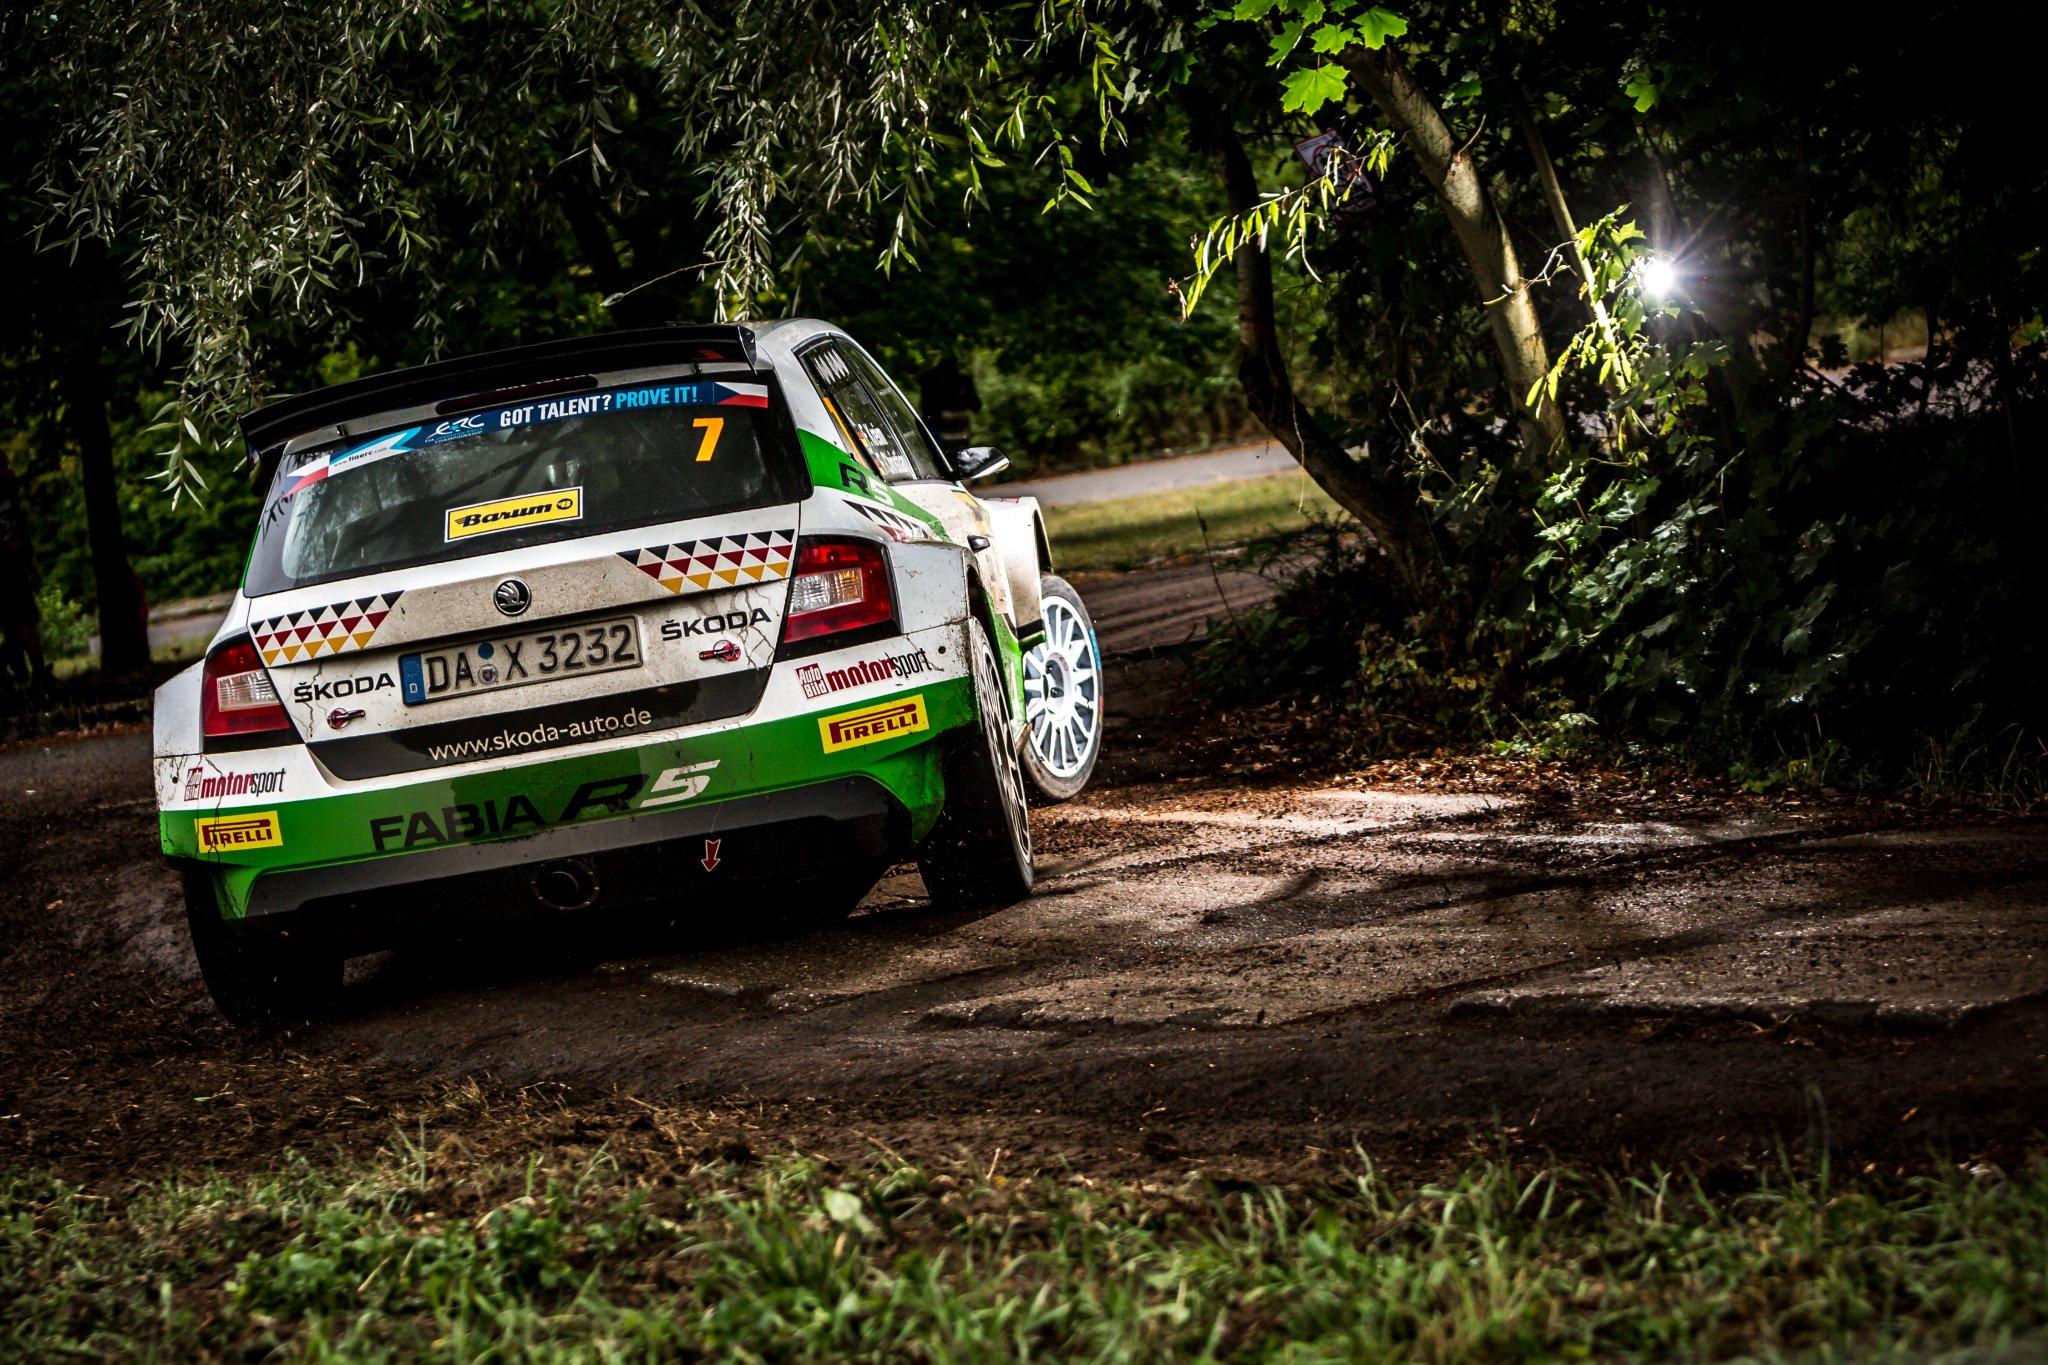 Rally Barum 2018 ERC - Página 2 Dlc7zEfW4AA0AvR